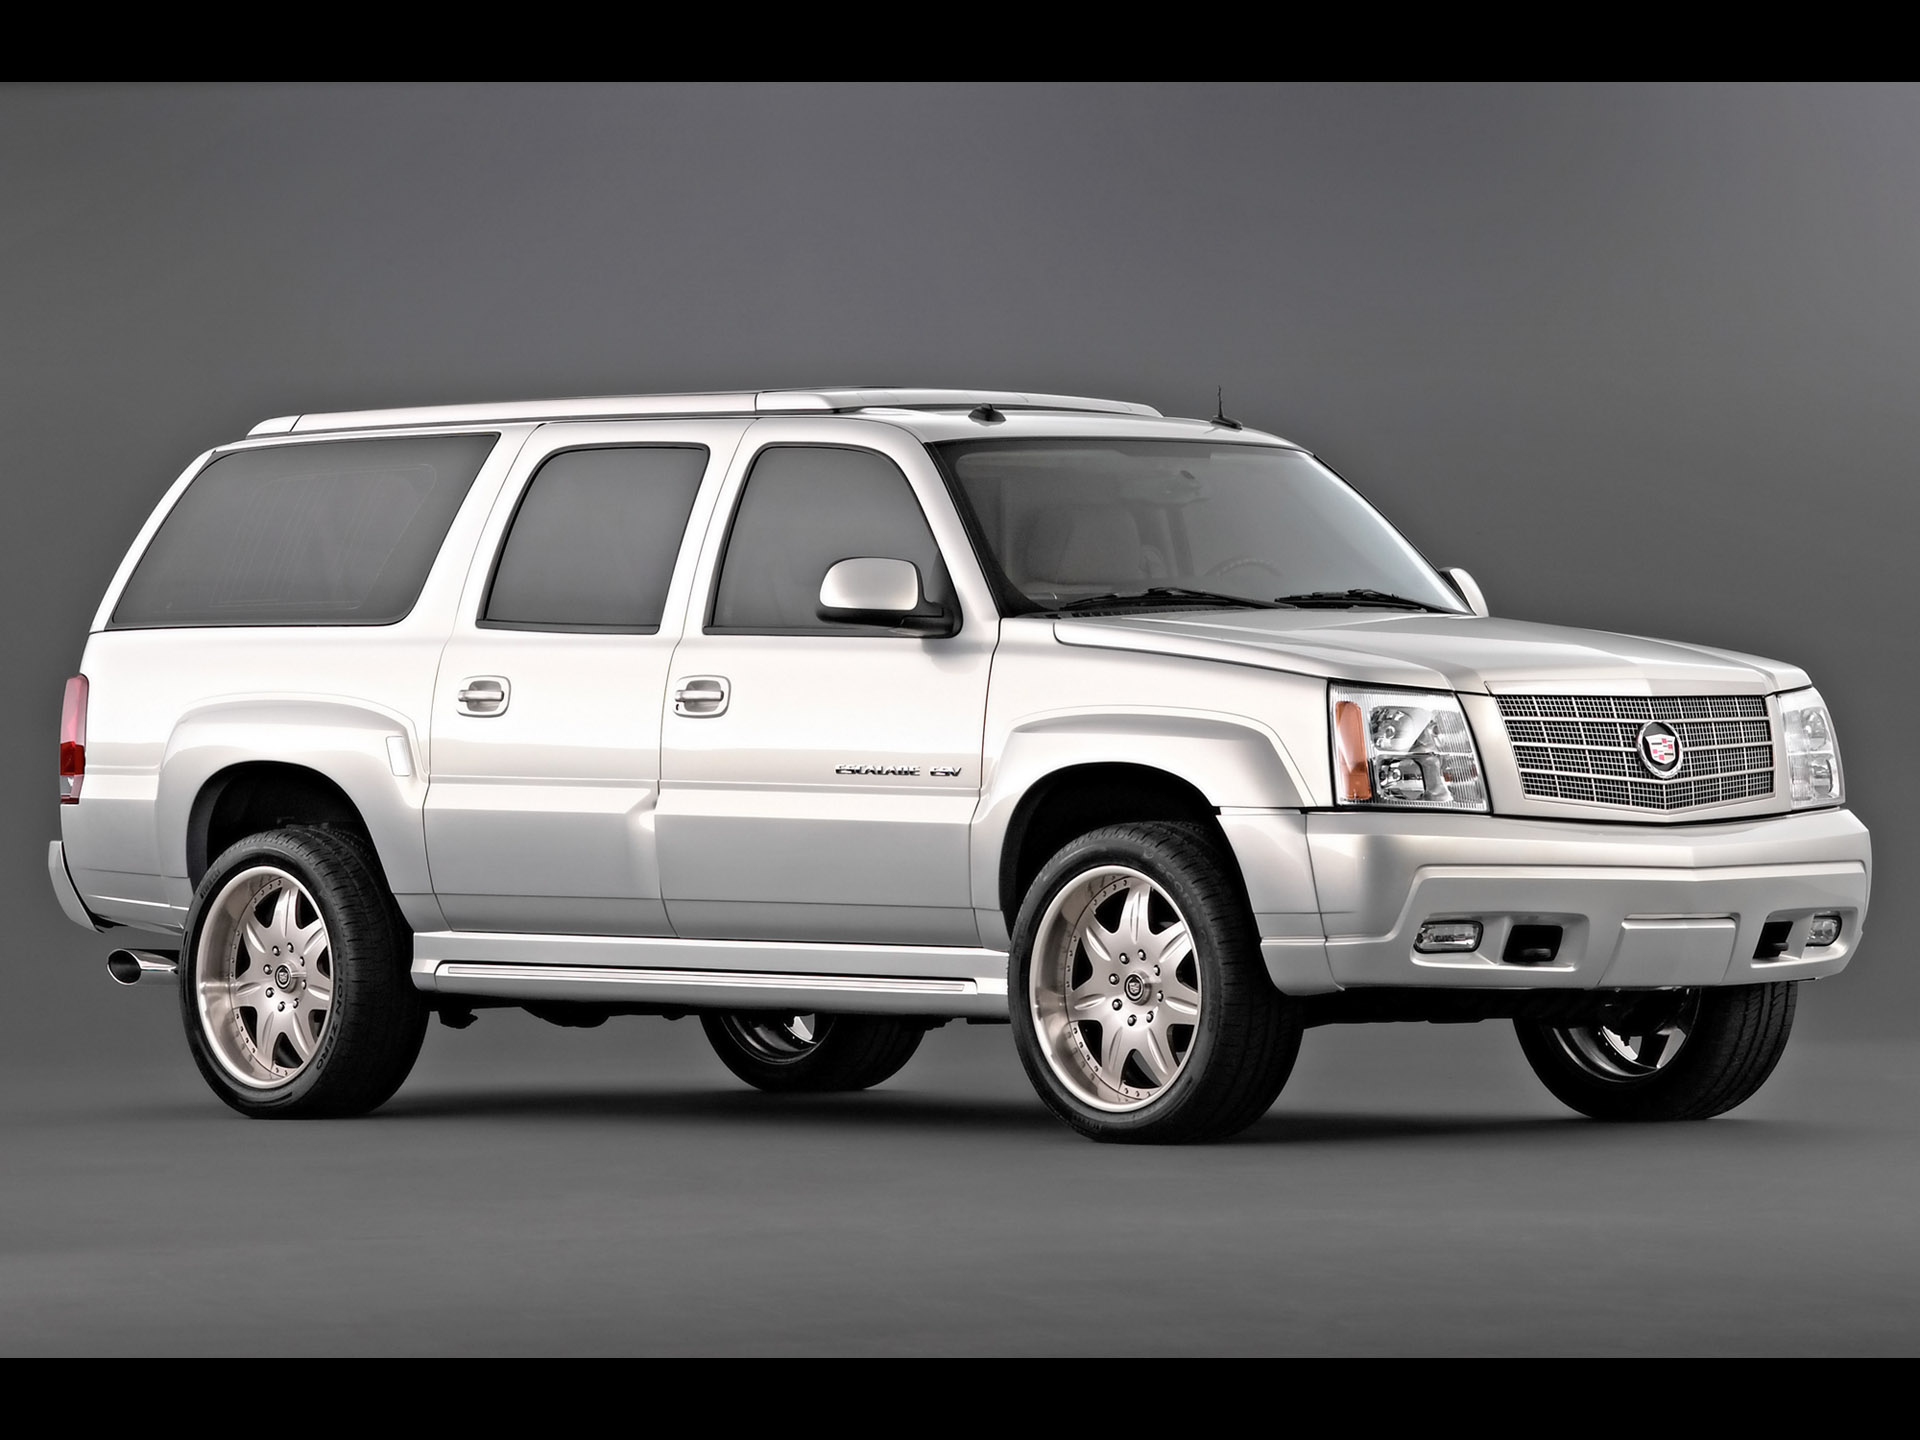 2003 Cadillac Escalade ESV - conceptcarz.com